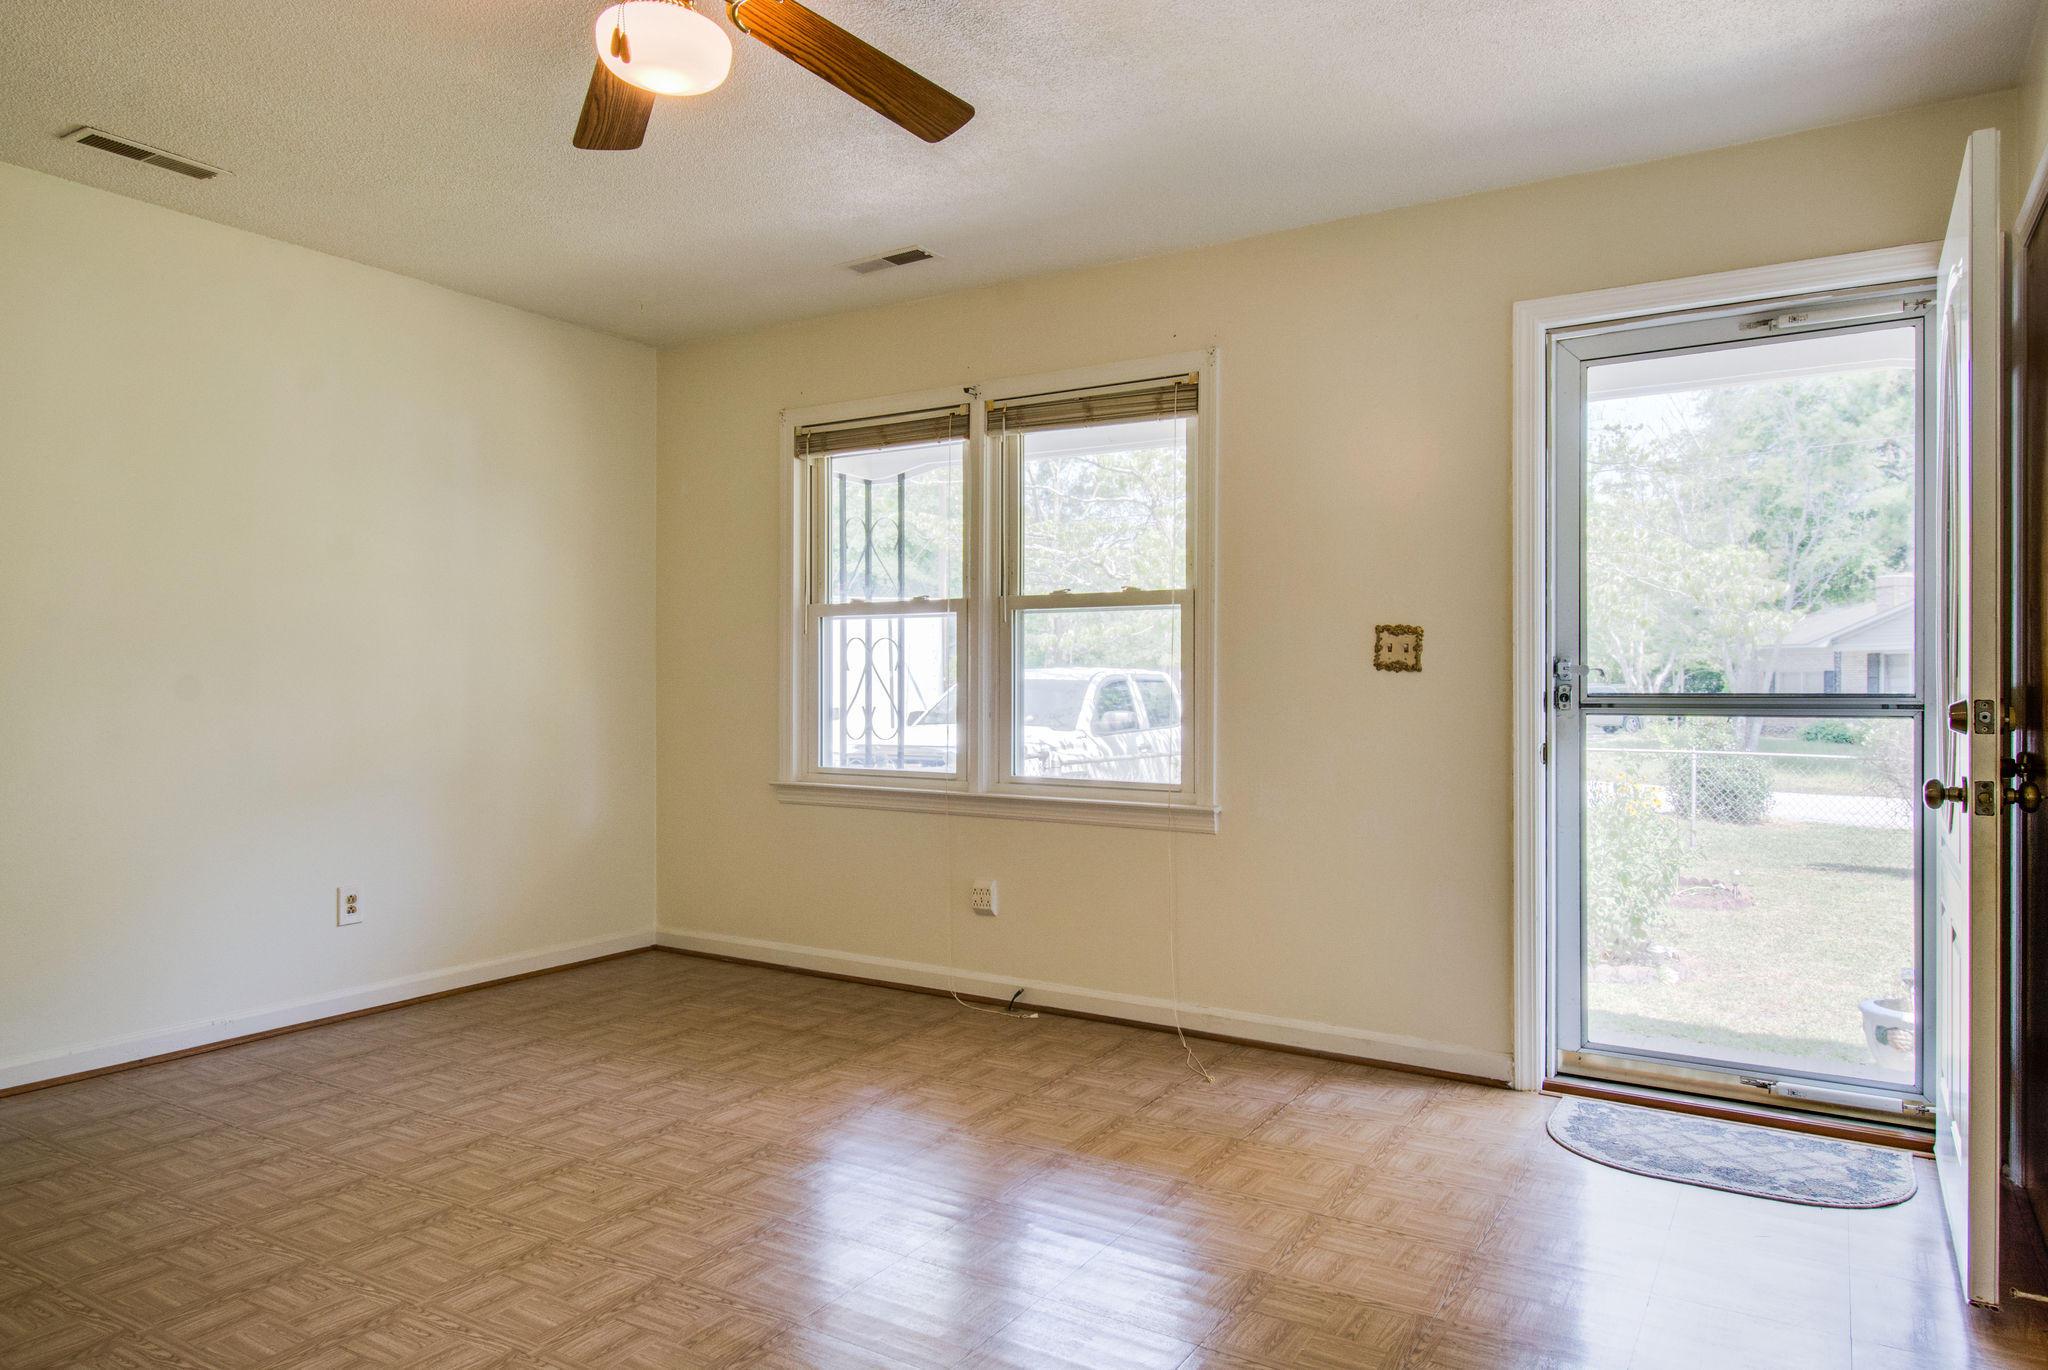 Old Mt Pleasant Homes For Sale - 1327 Lonnie, Mount Pleasant, SC - 0